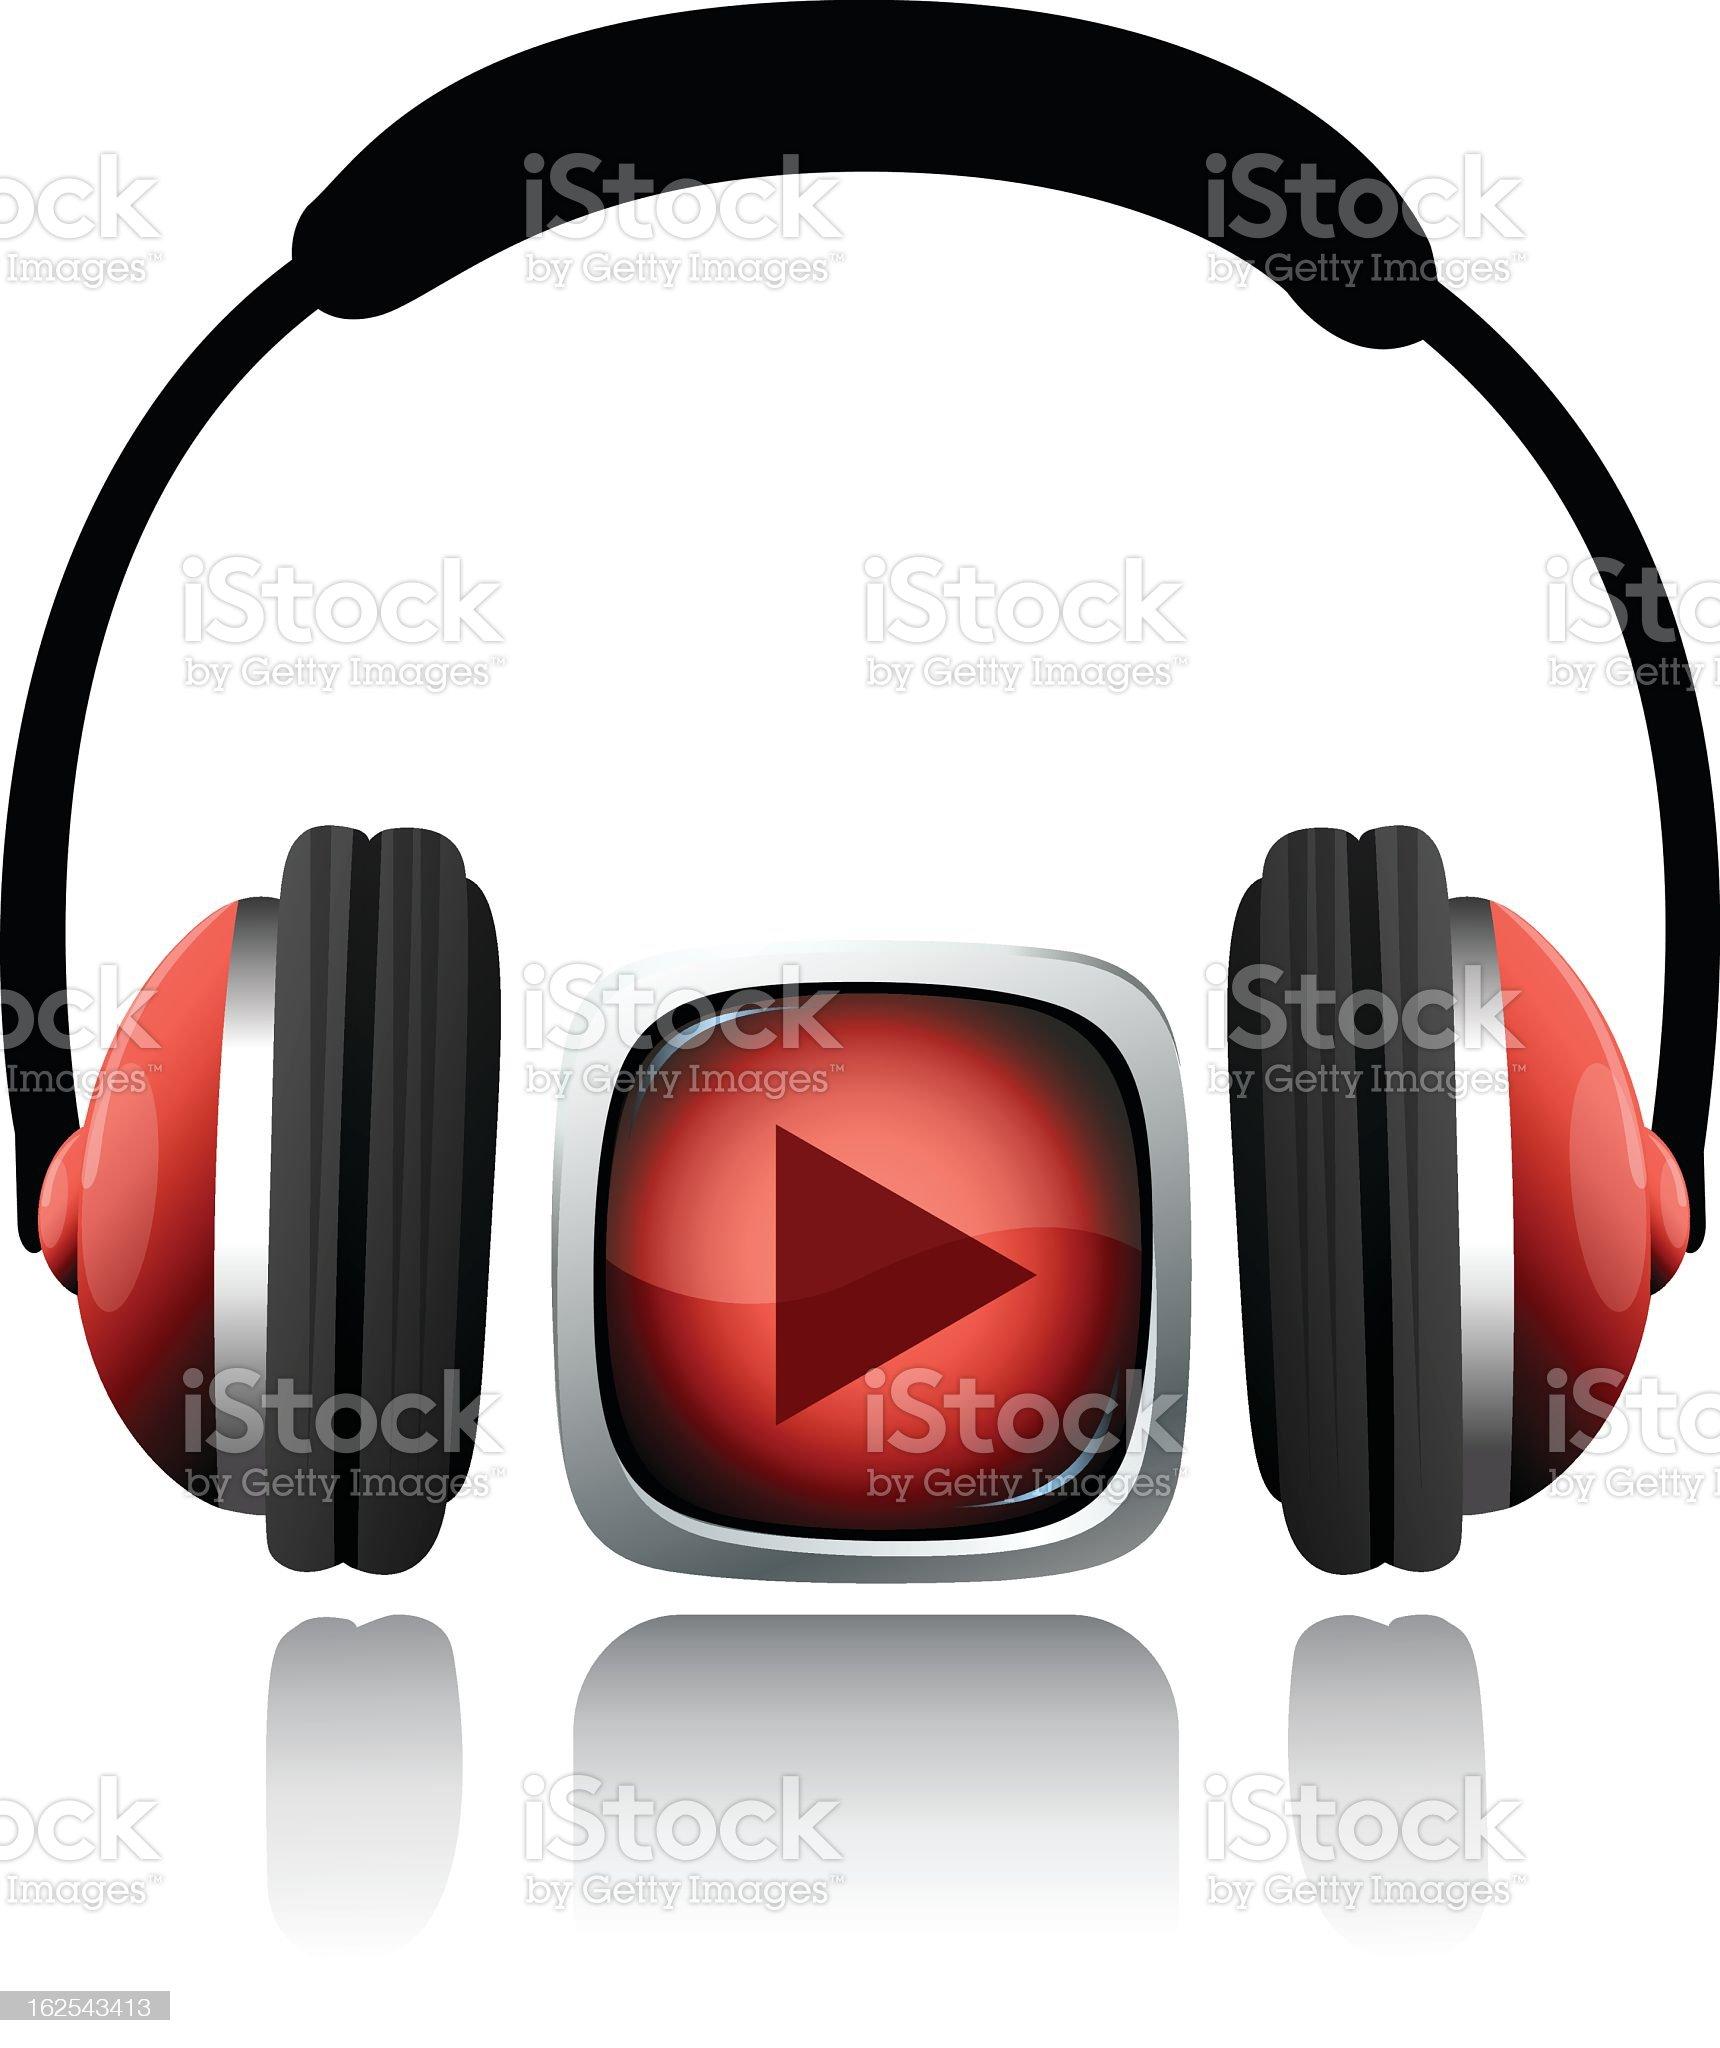 speakerphones royalty-free stock vector art